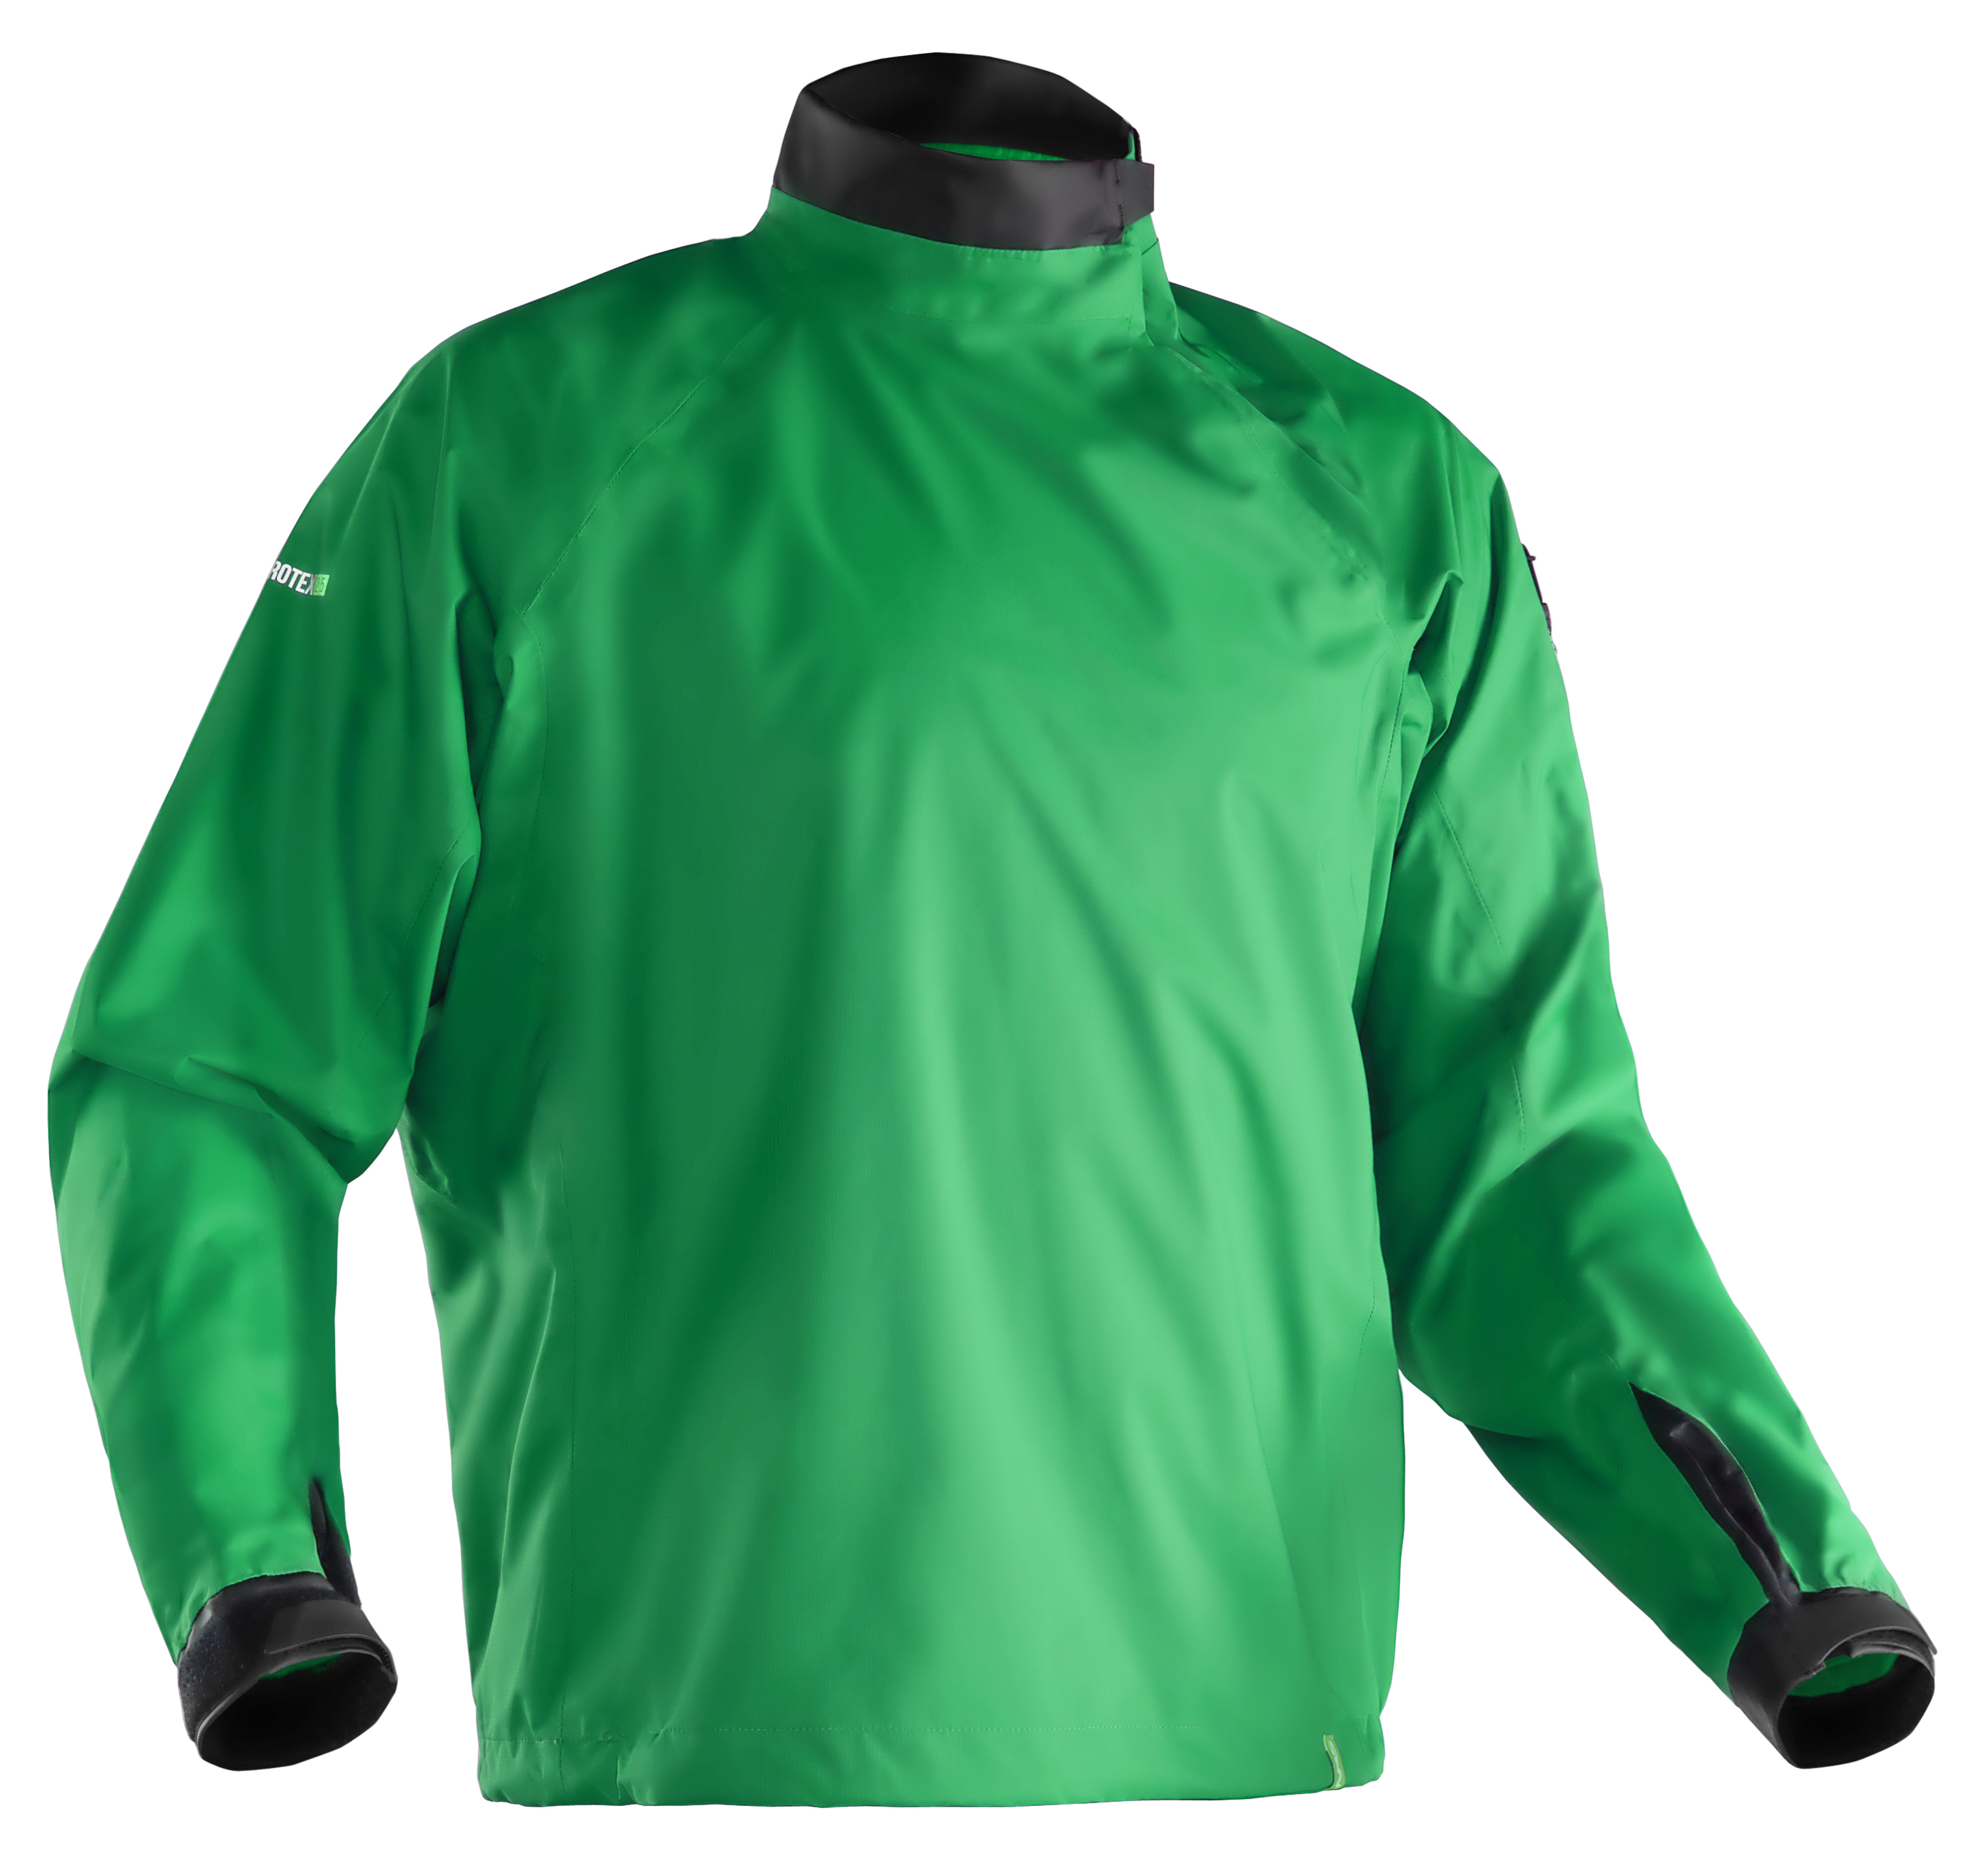 2018 NRS Men's Endurance Splash Jacket